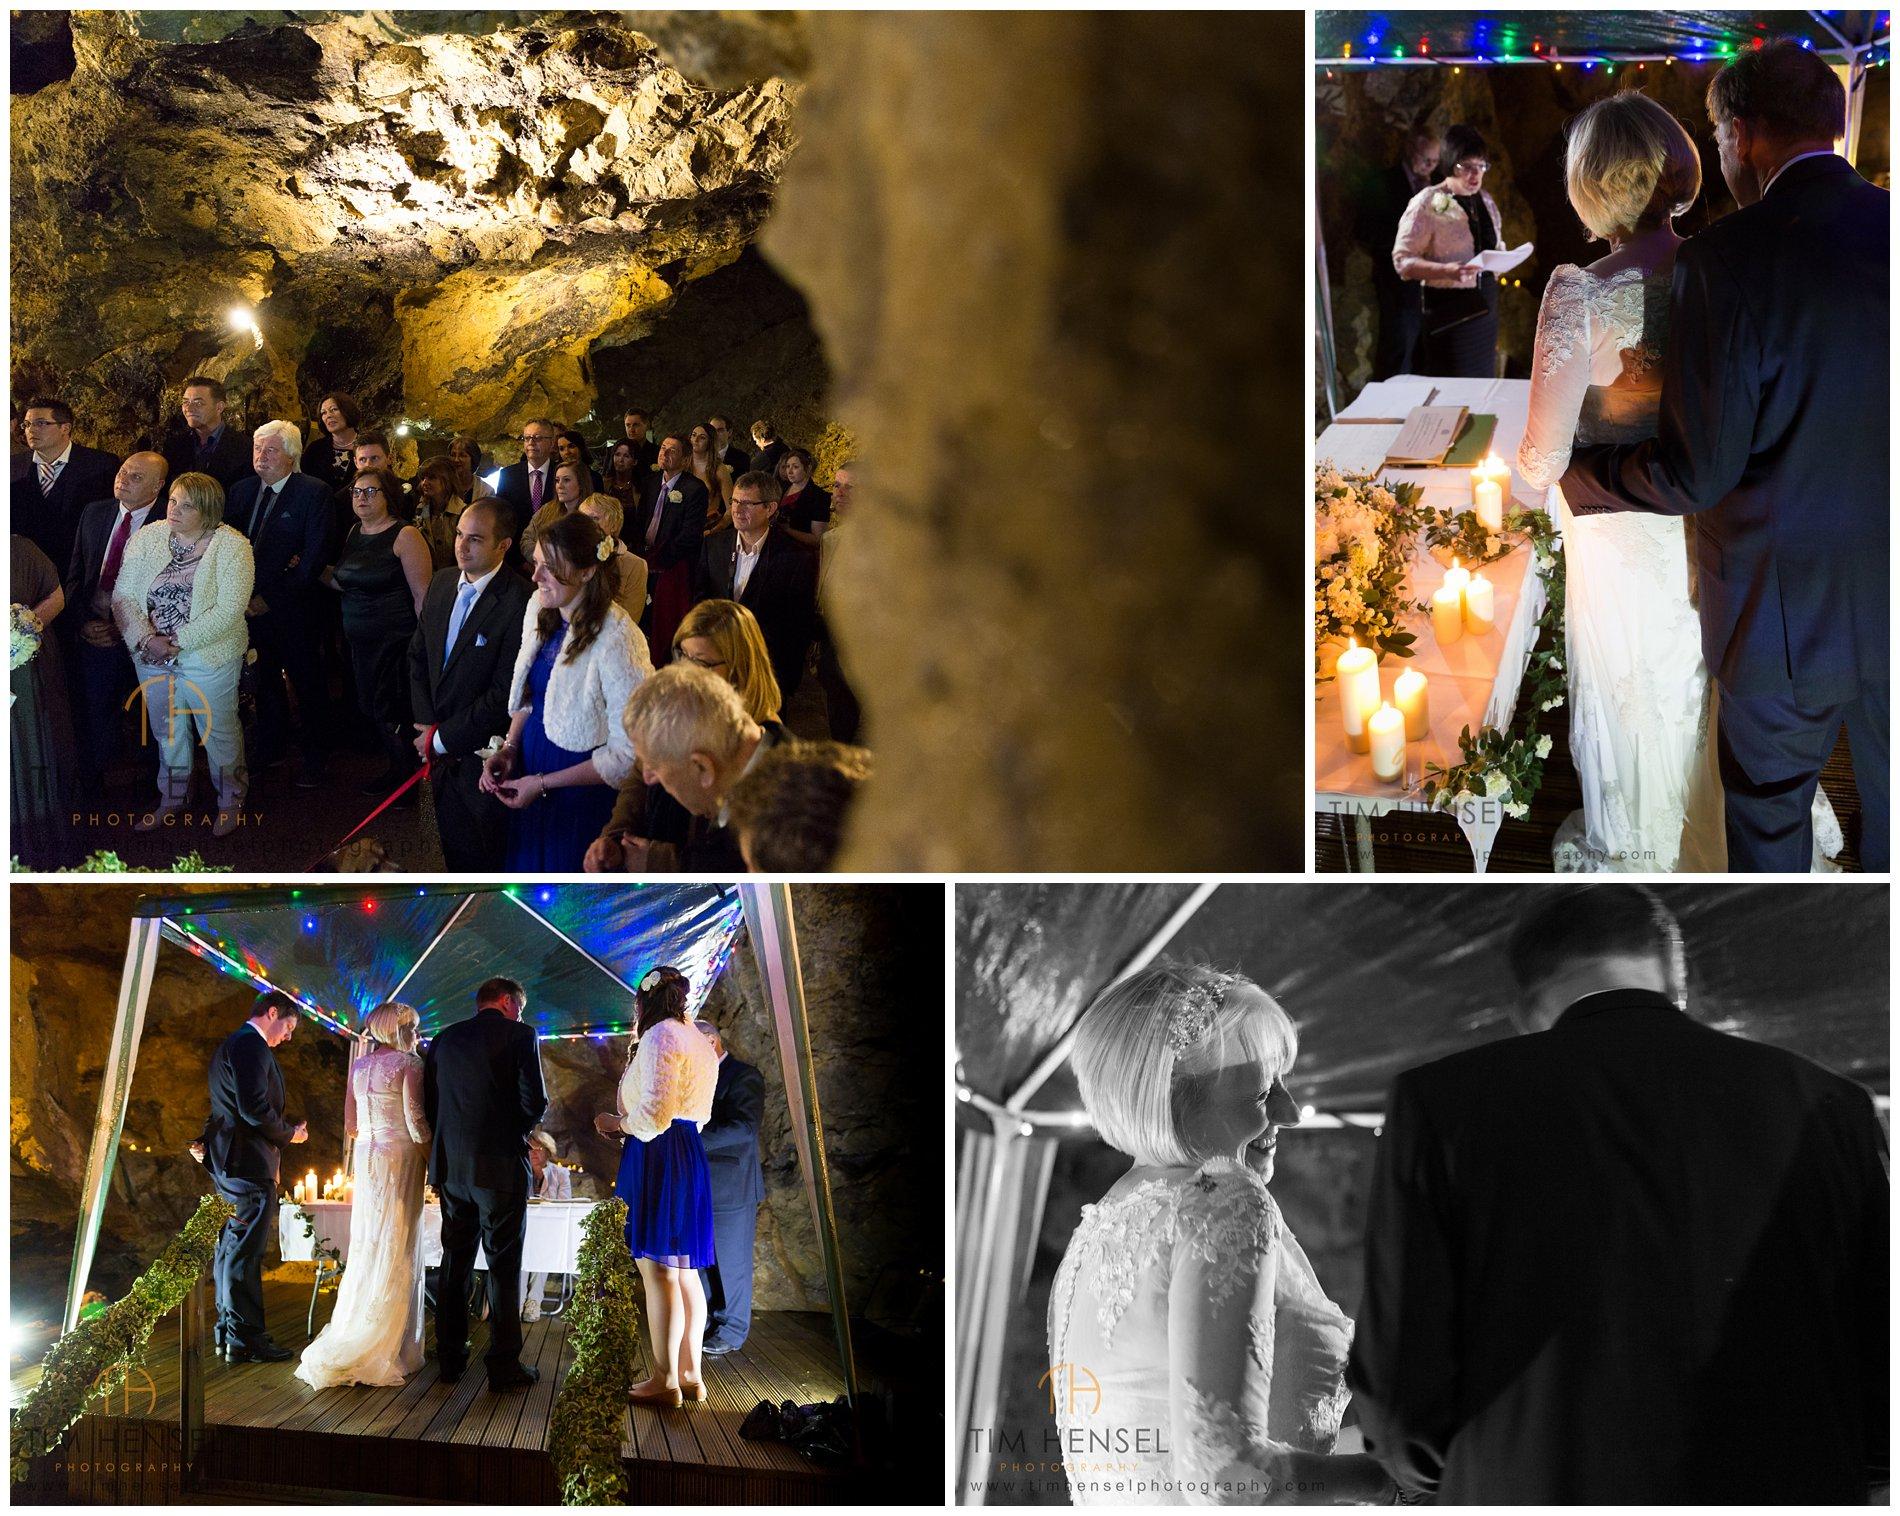 A wedding photographer in Treak Cliff Cavern in Castleton